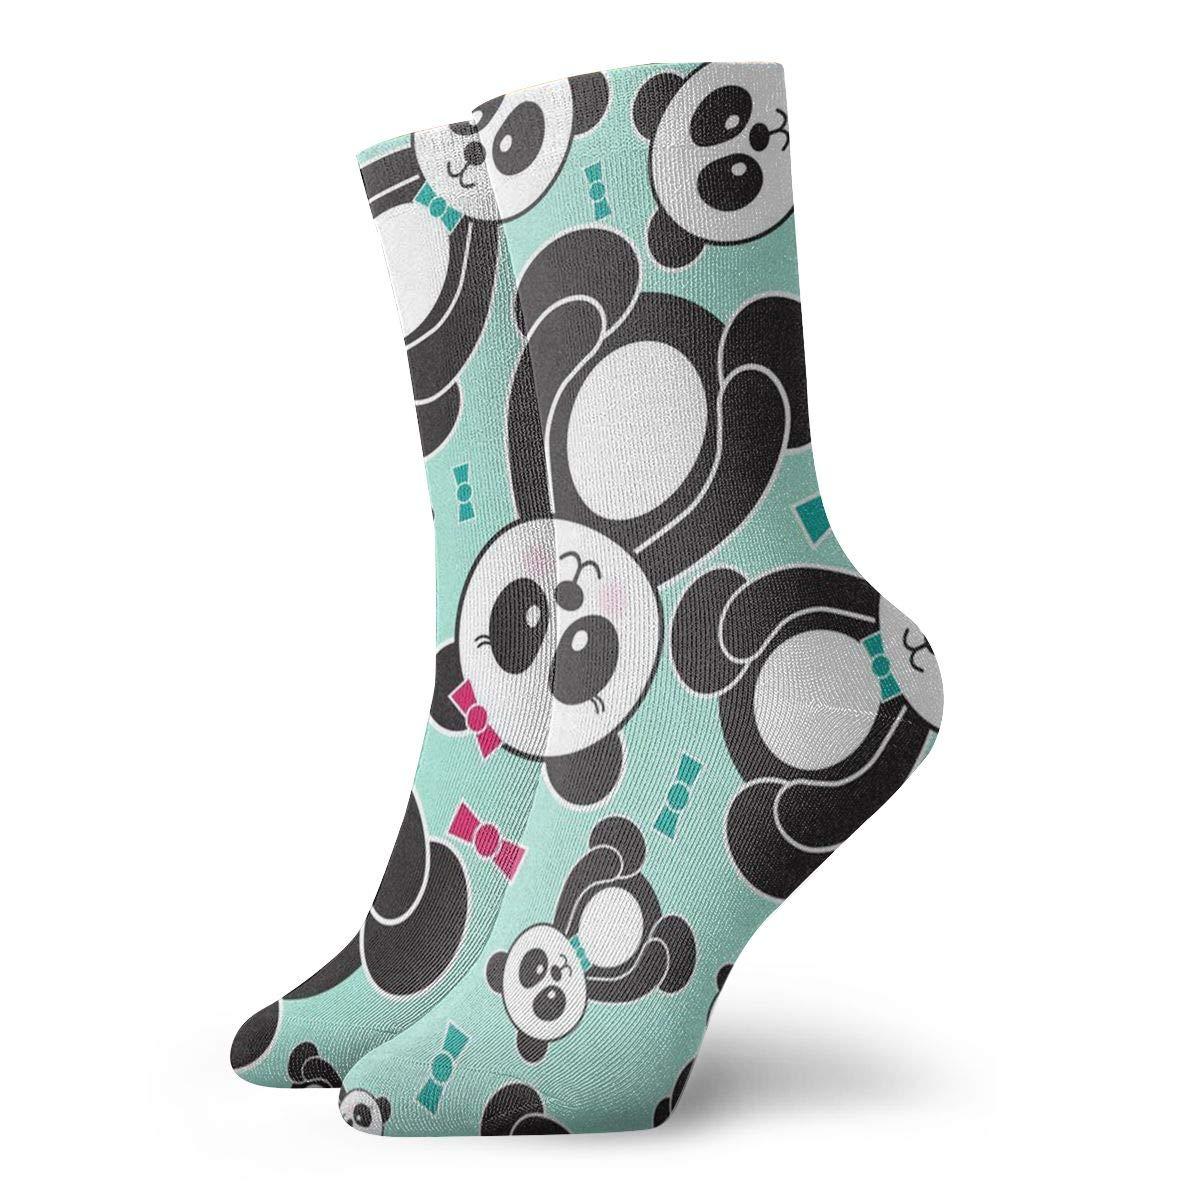 Cute Panda Unisex Funny Casual Crew Socks Athletic Socks For Boys Girls Kids Teenagers